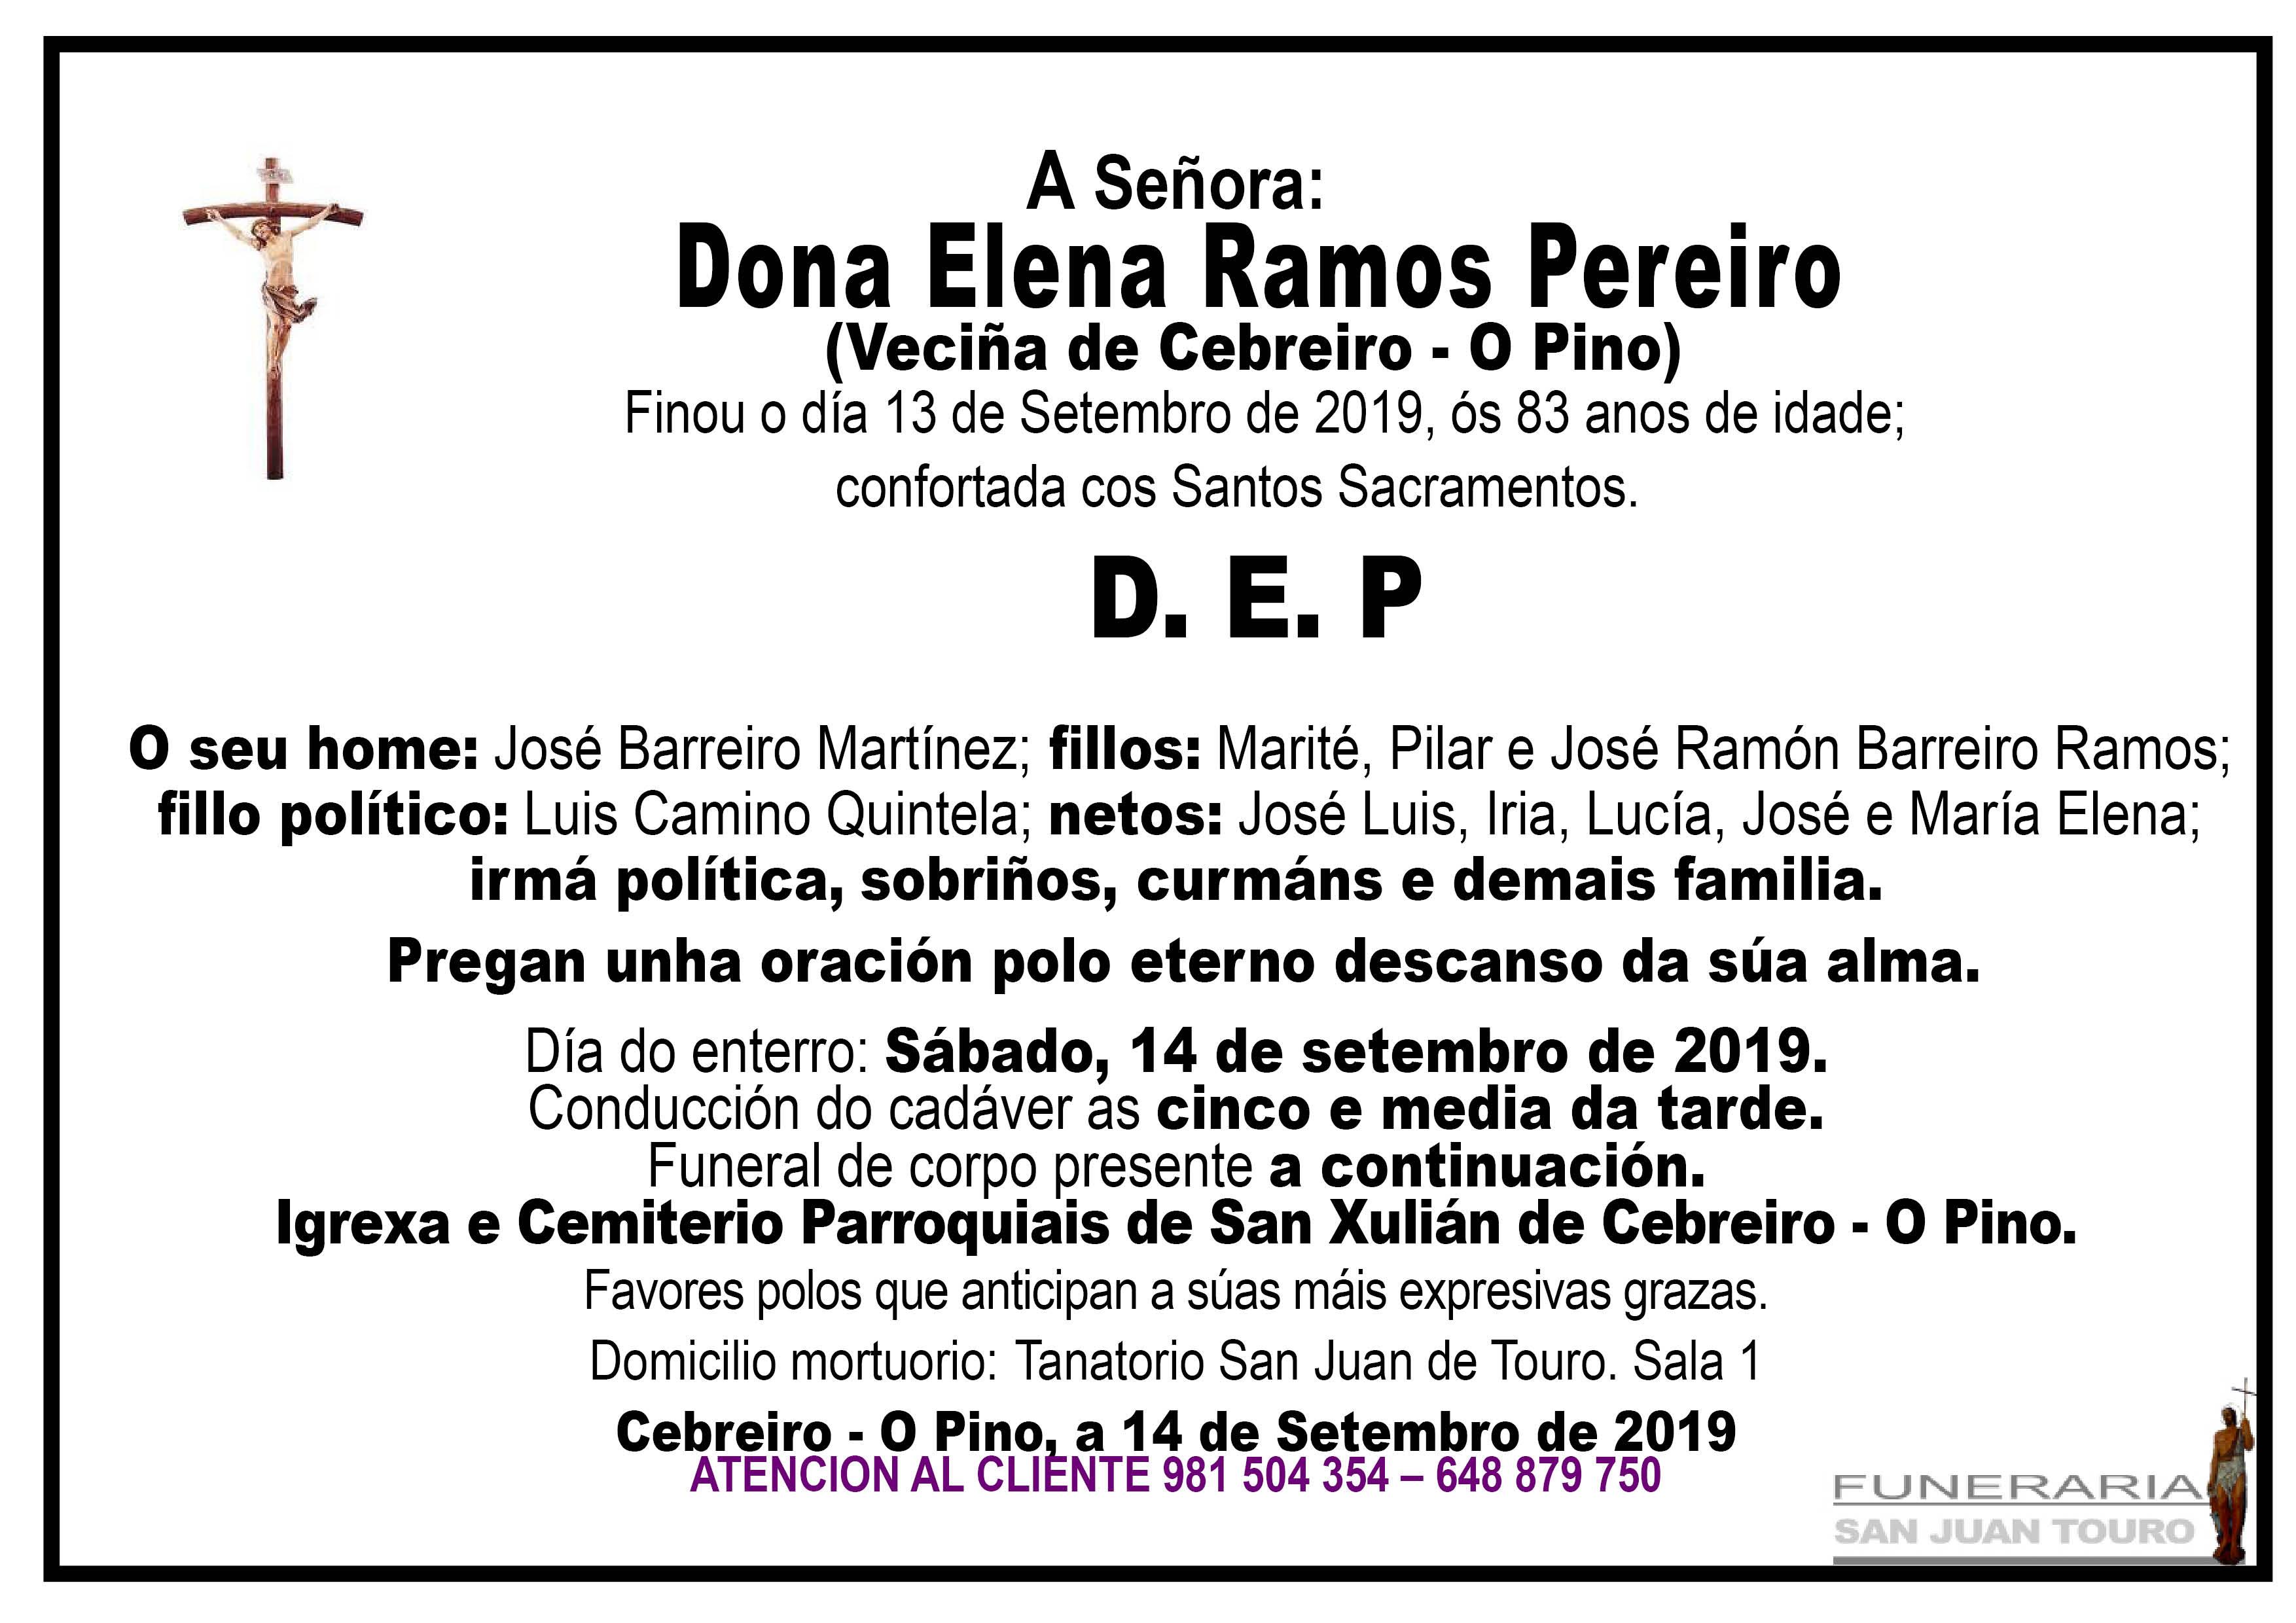 Esquela de SEPELIO DE DONA ELENA RAMOS PEREIRO